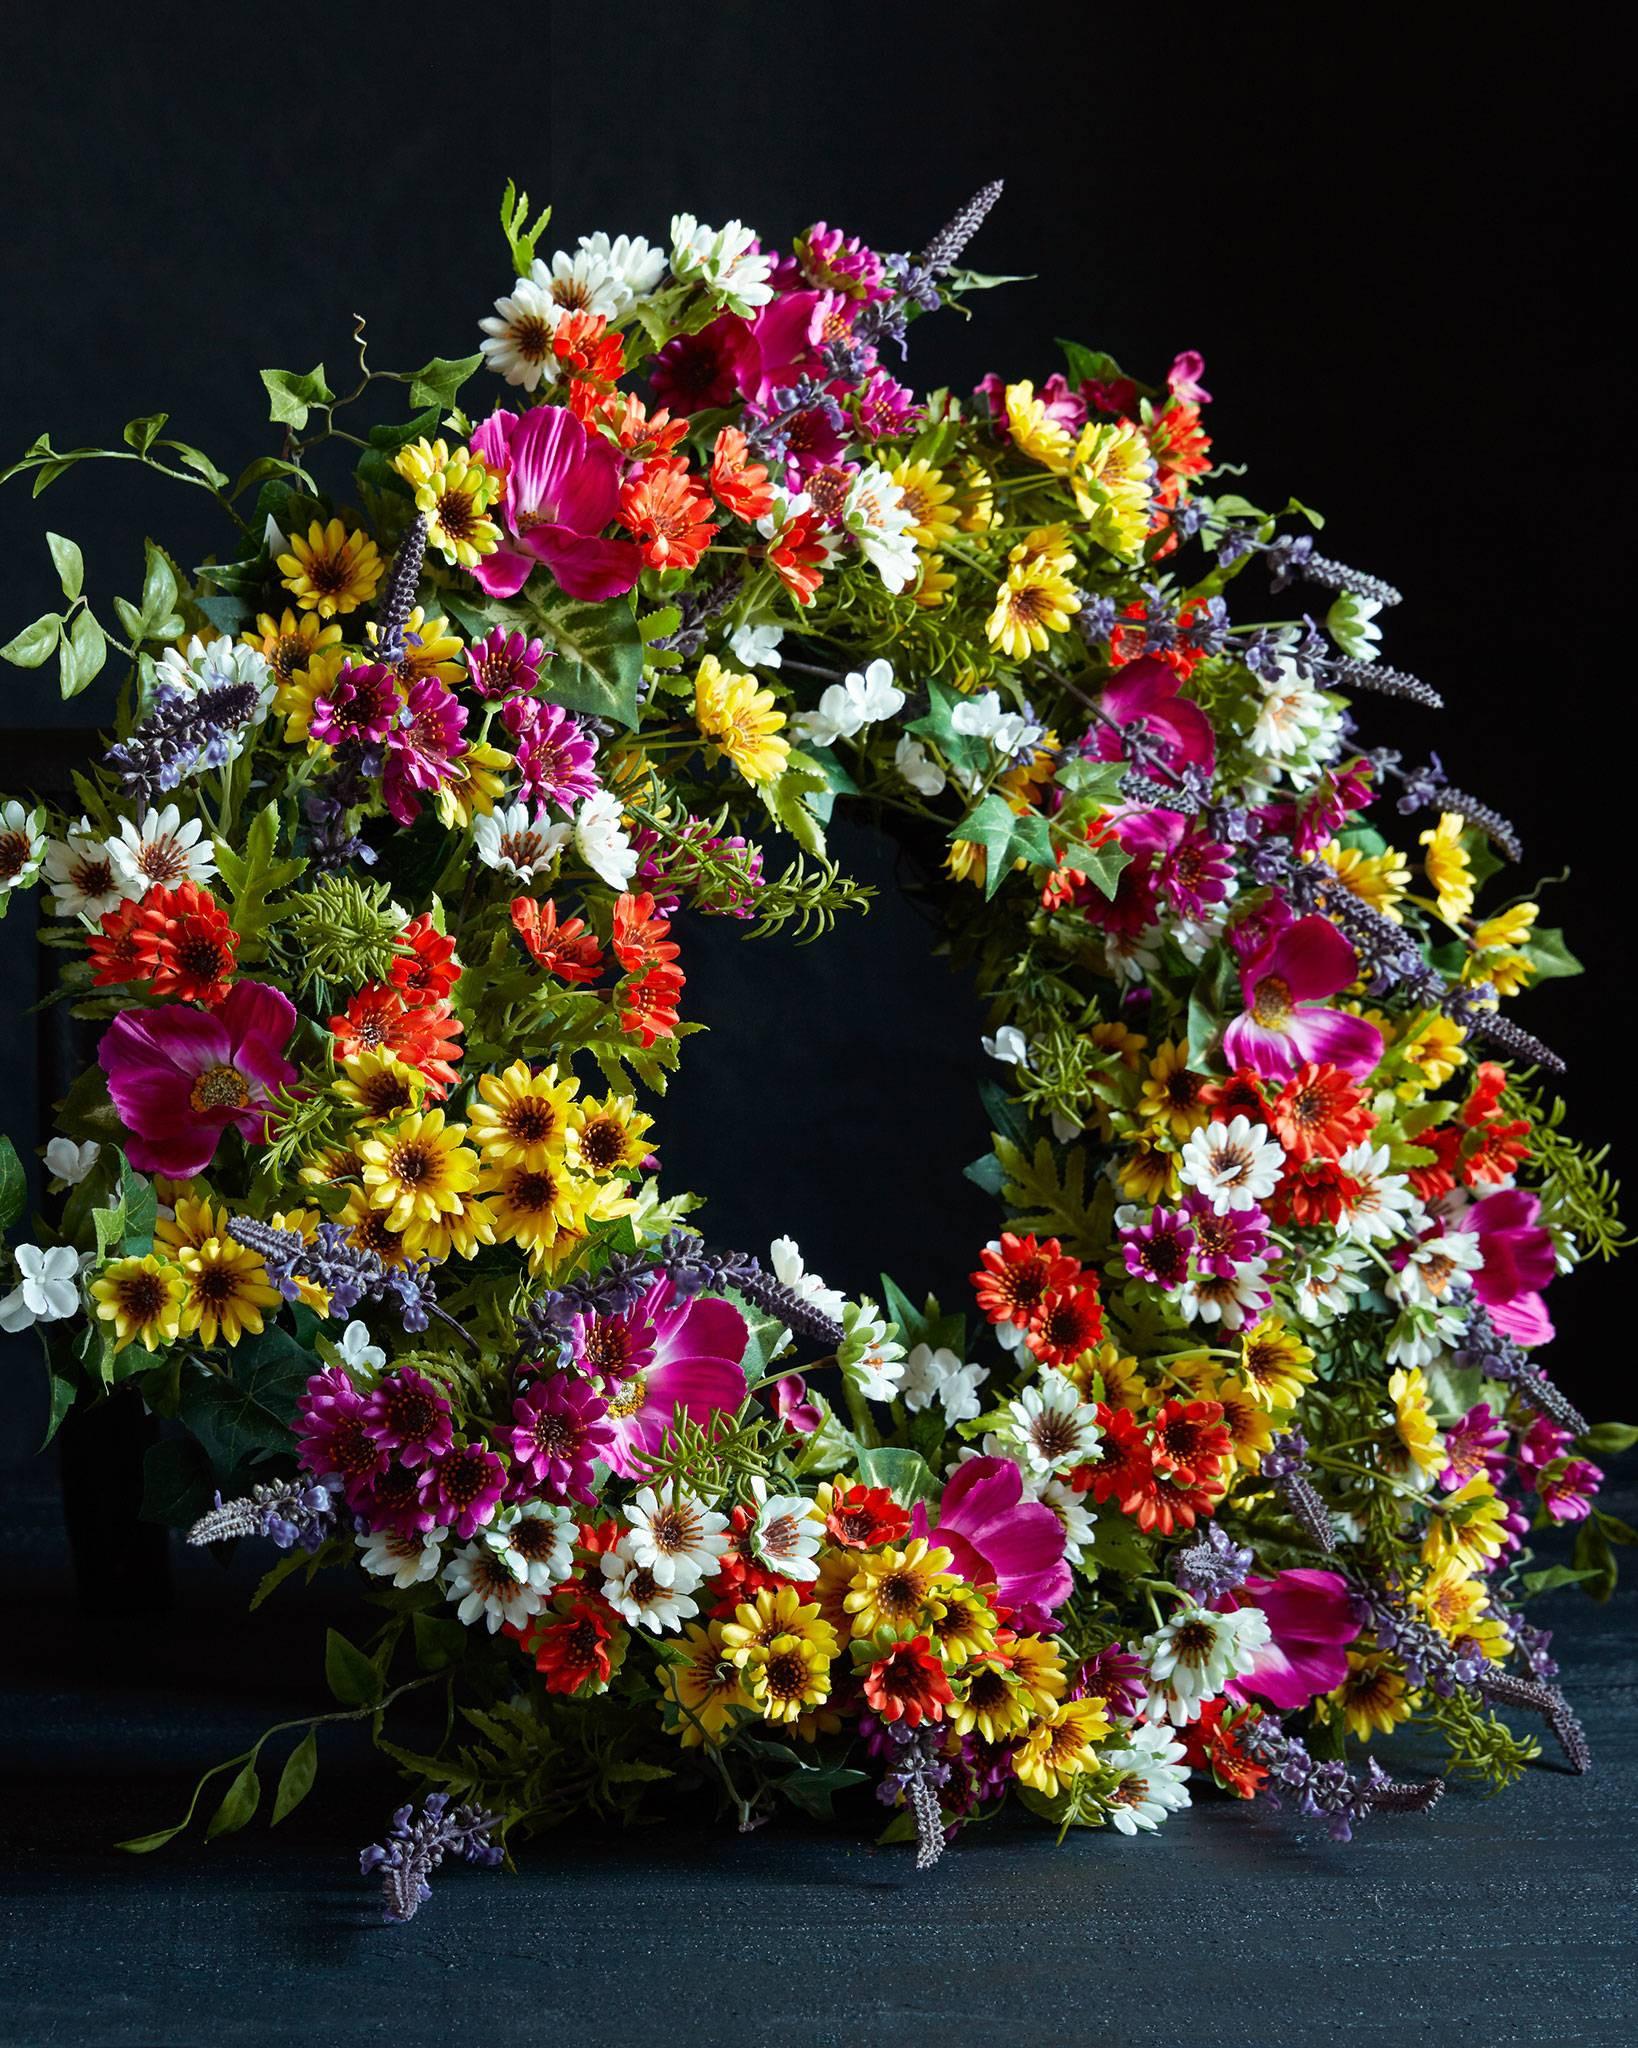 Outdoor Safe Florals